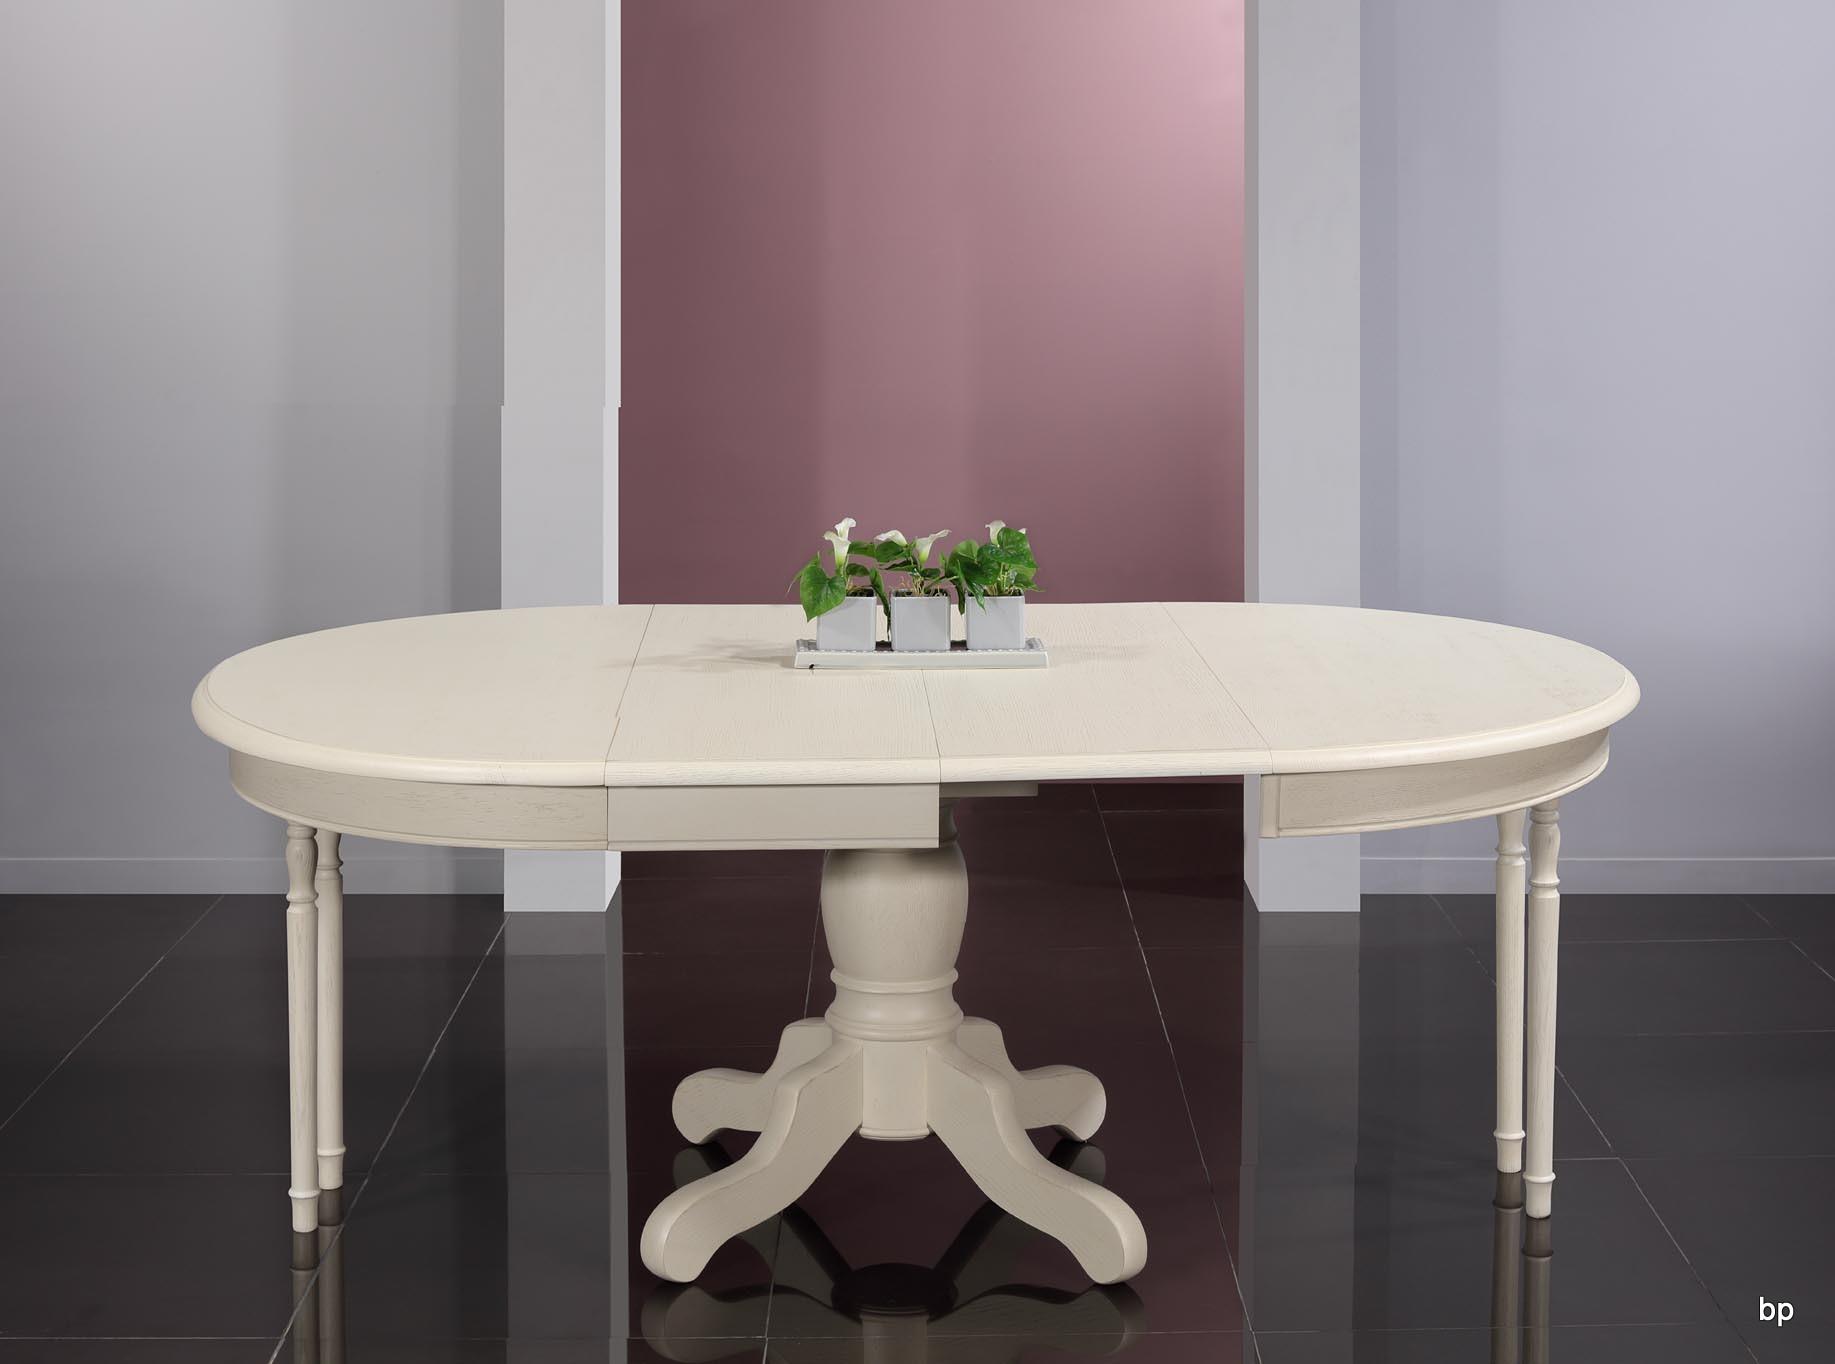 table ronde pied central en ch ne massif de style louis philippe diametre 120 finition lin. Black Bedroom Furniture Sets. Home Design Ideas